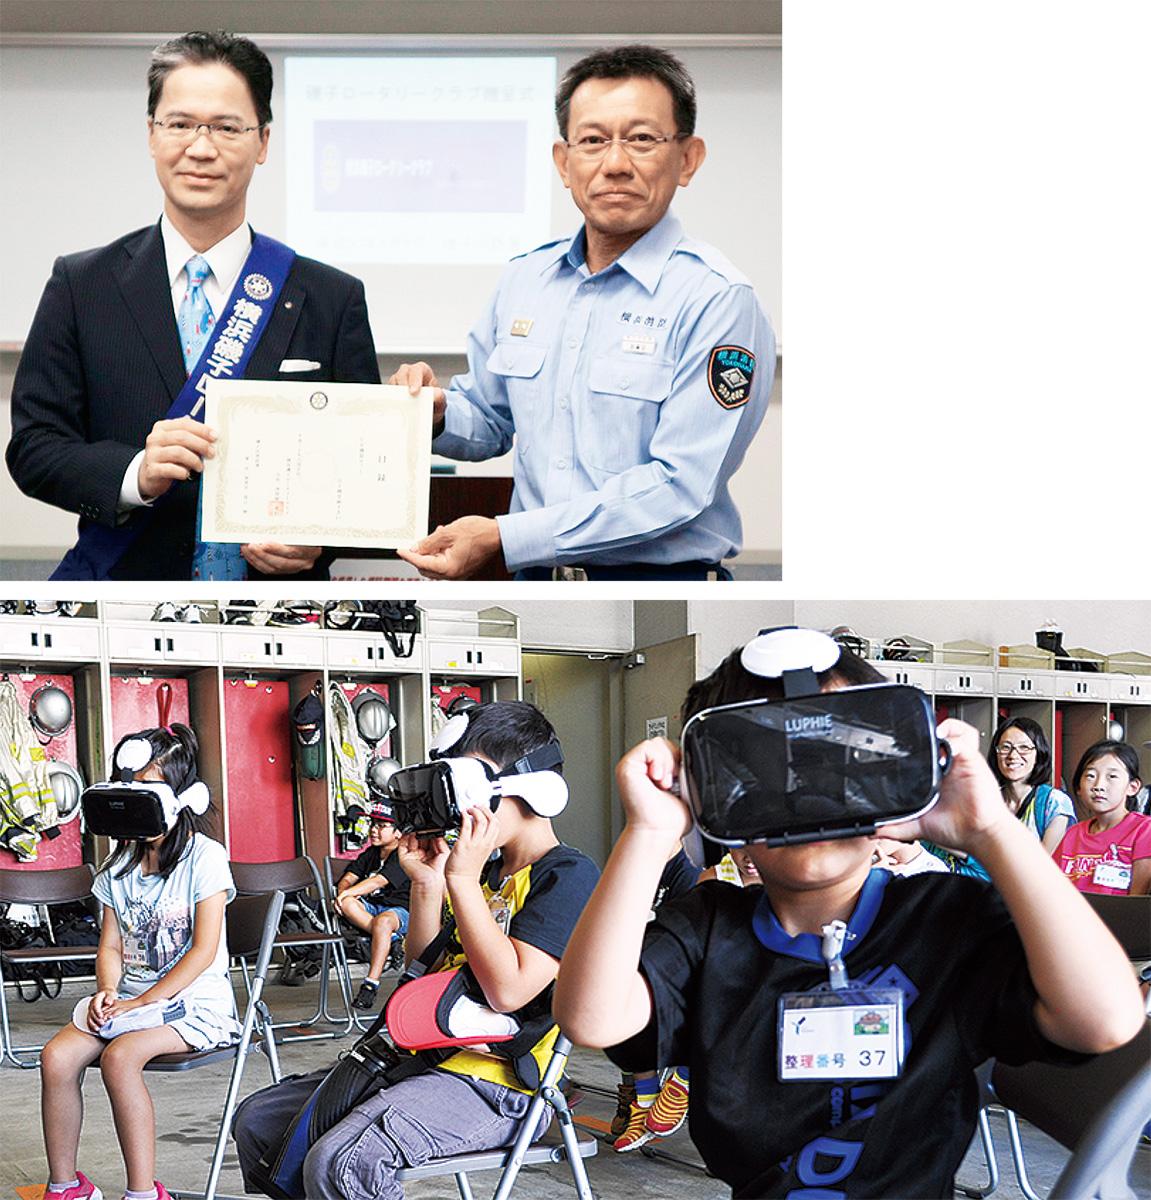 VR機器を消防署に寄贈